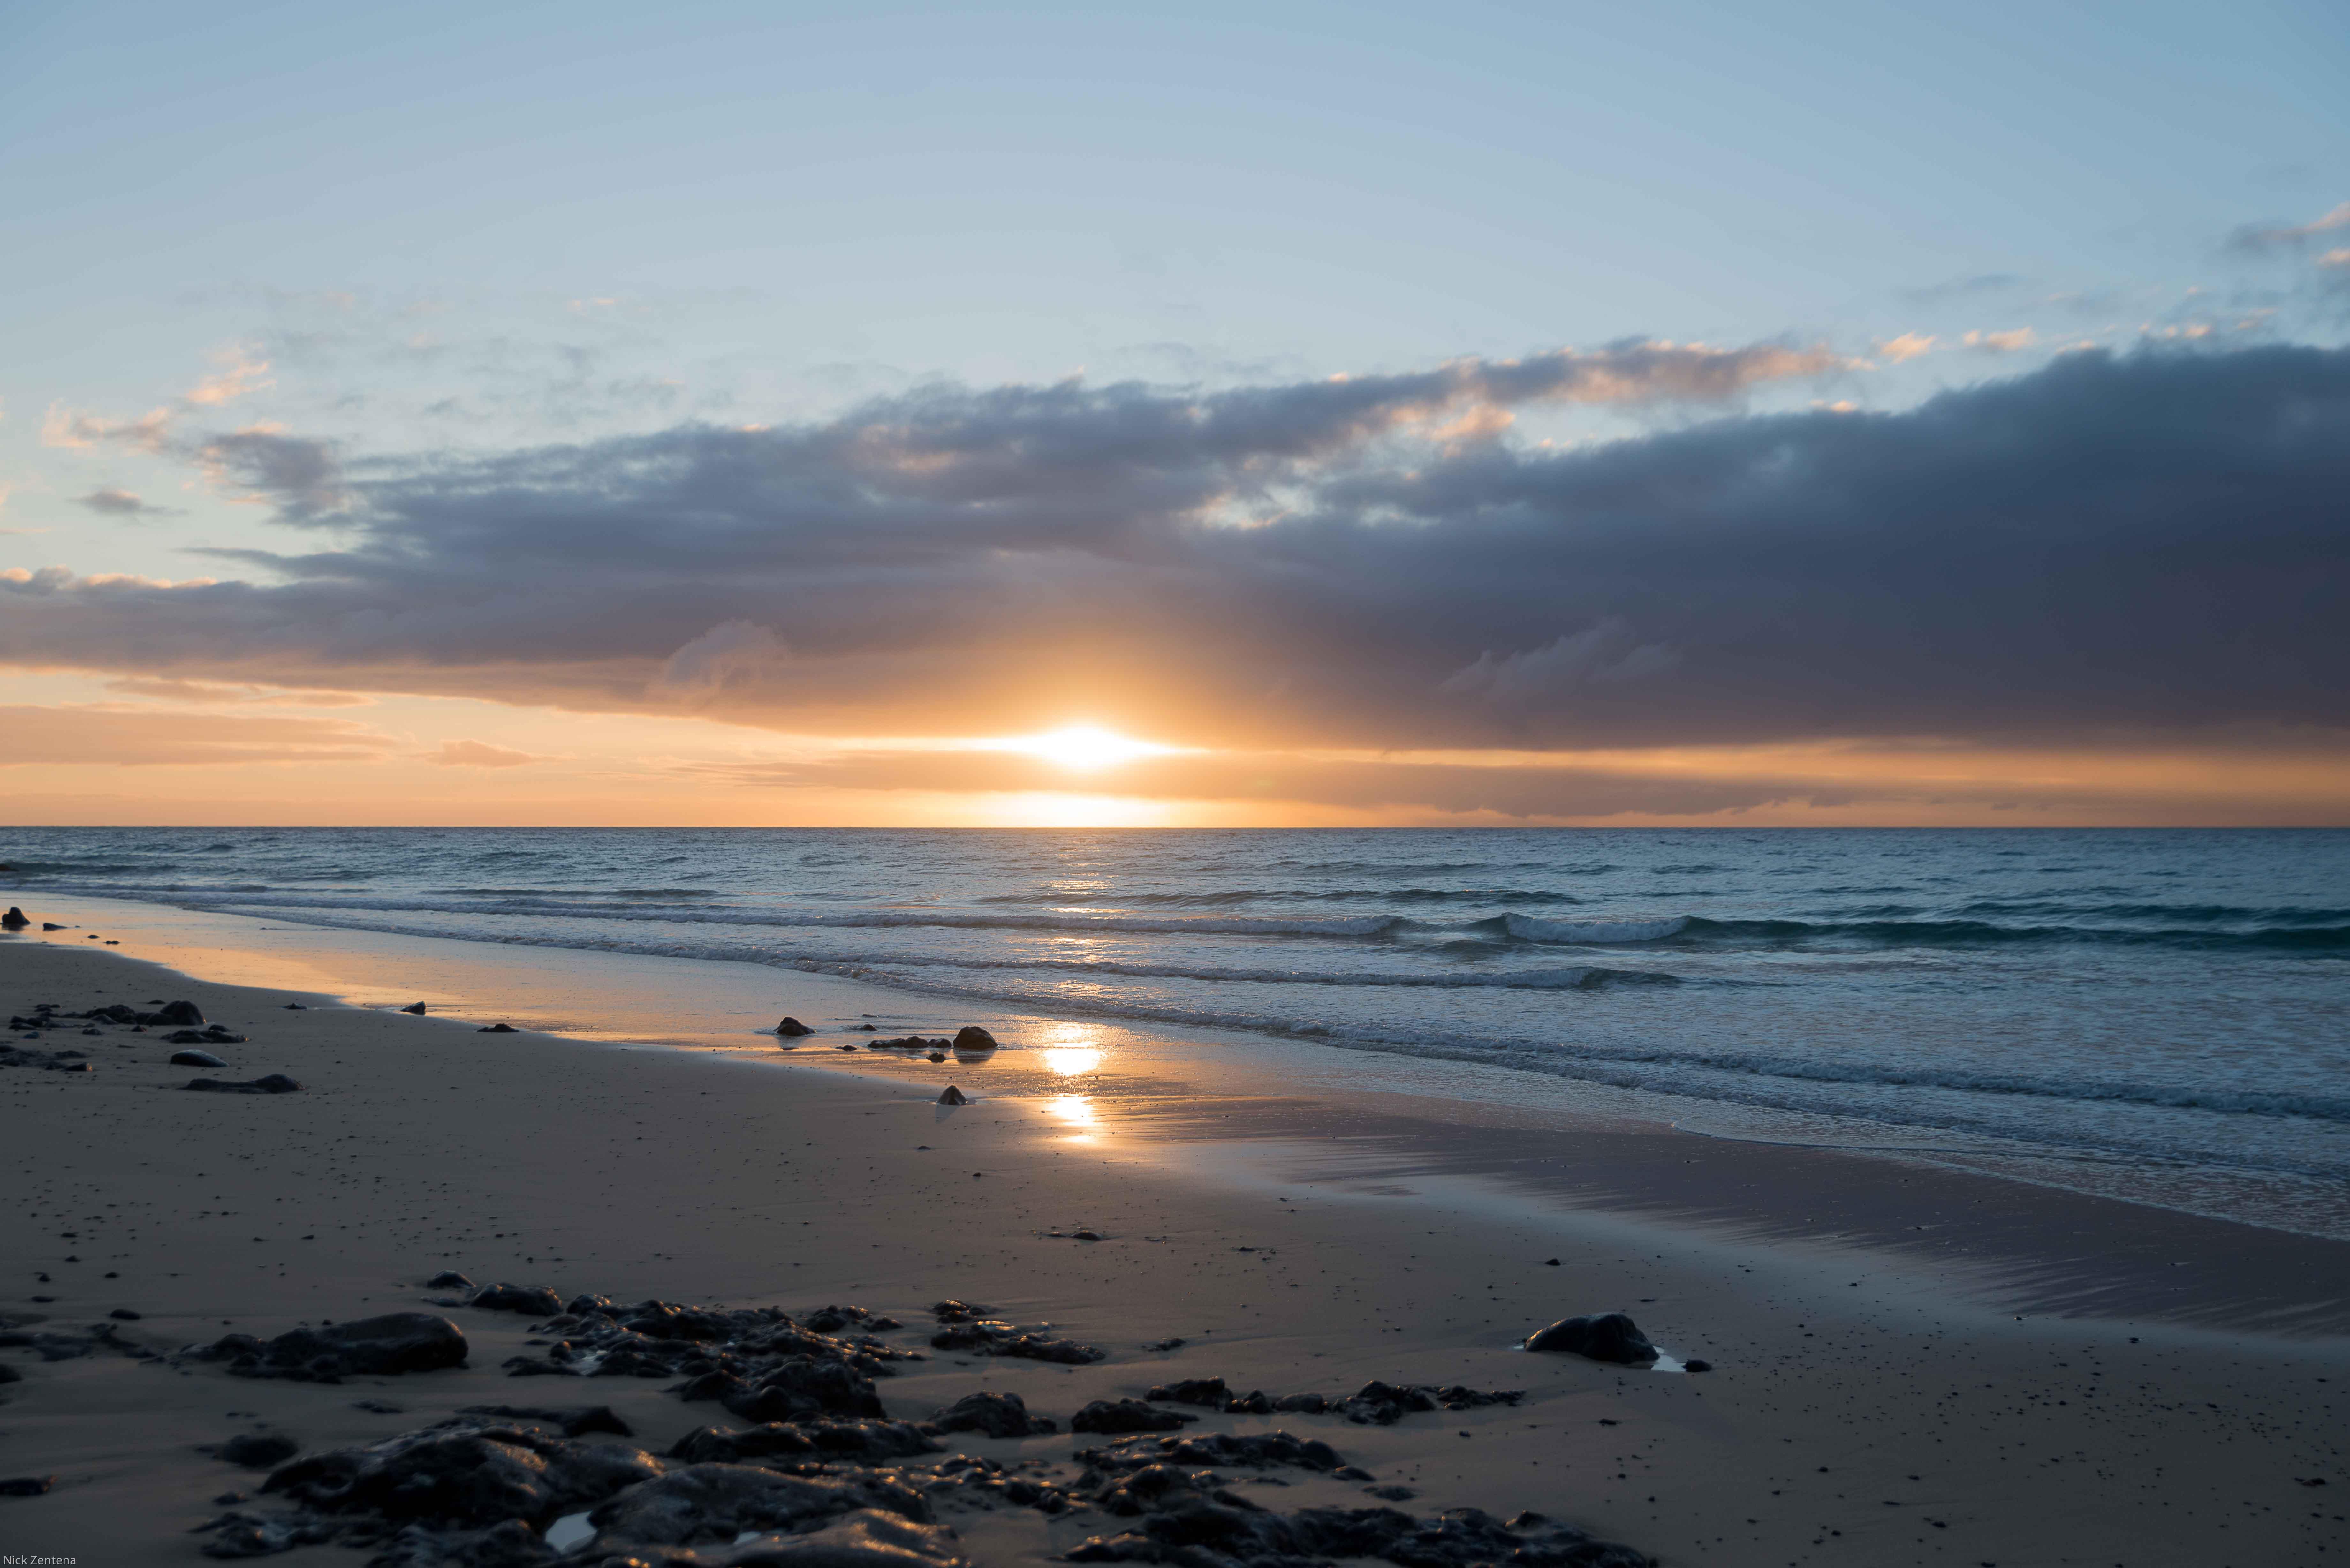 Sunrise over Playa del Matorral Jandia Fuerteventura Spain